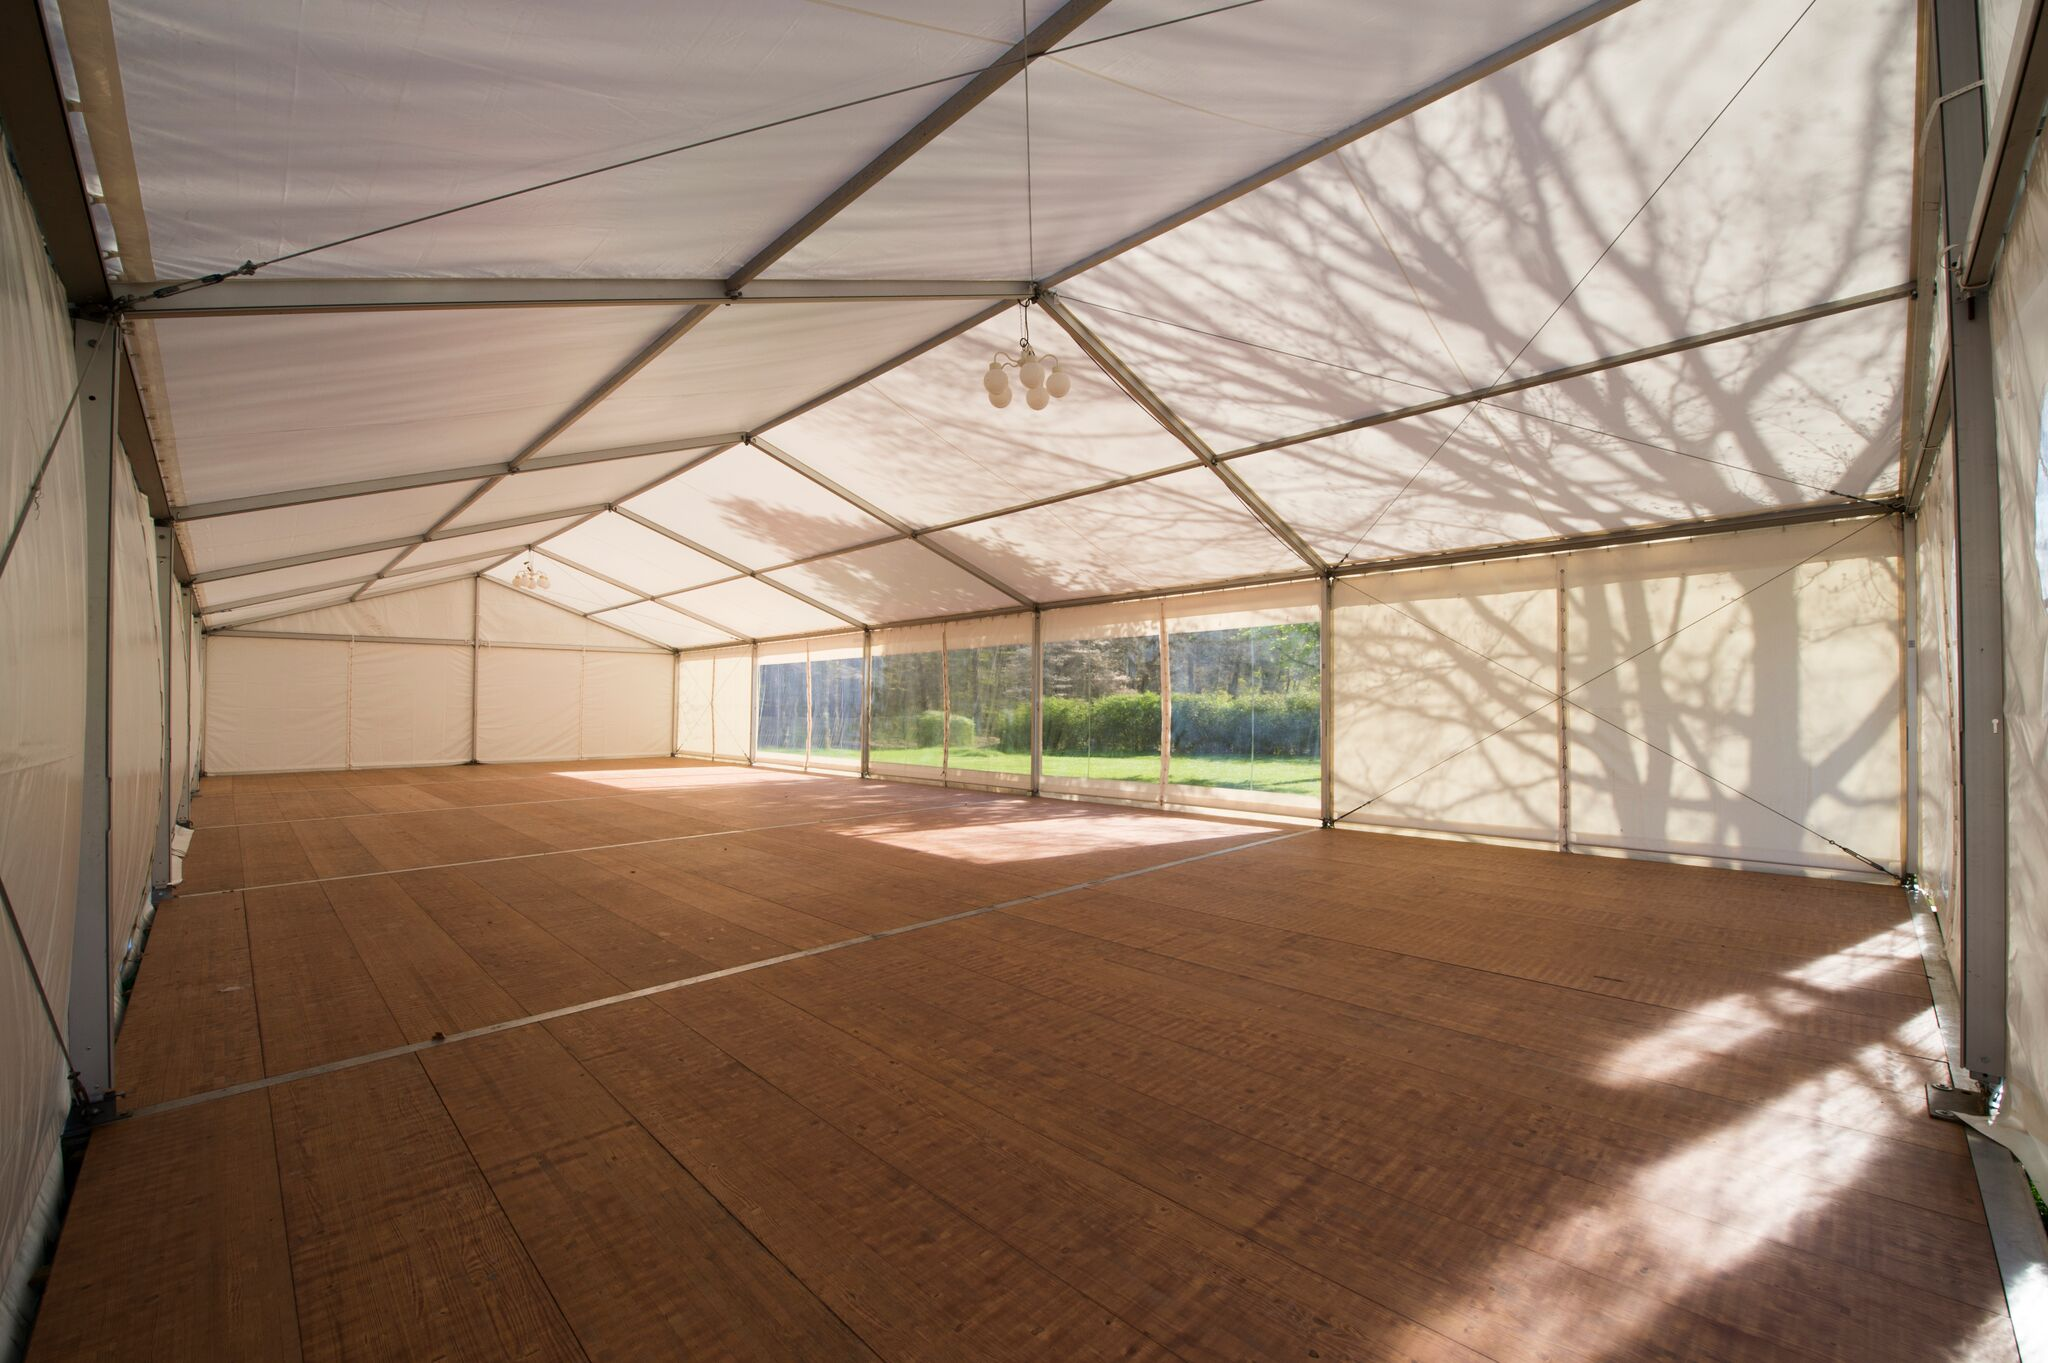 Fußboden Zelt ~ Fussböden meznar zeltverleih